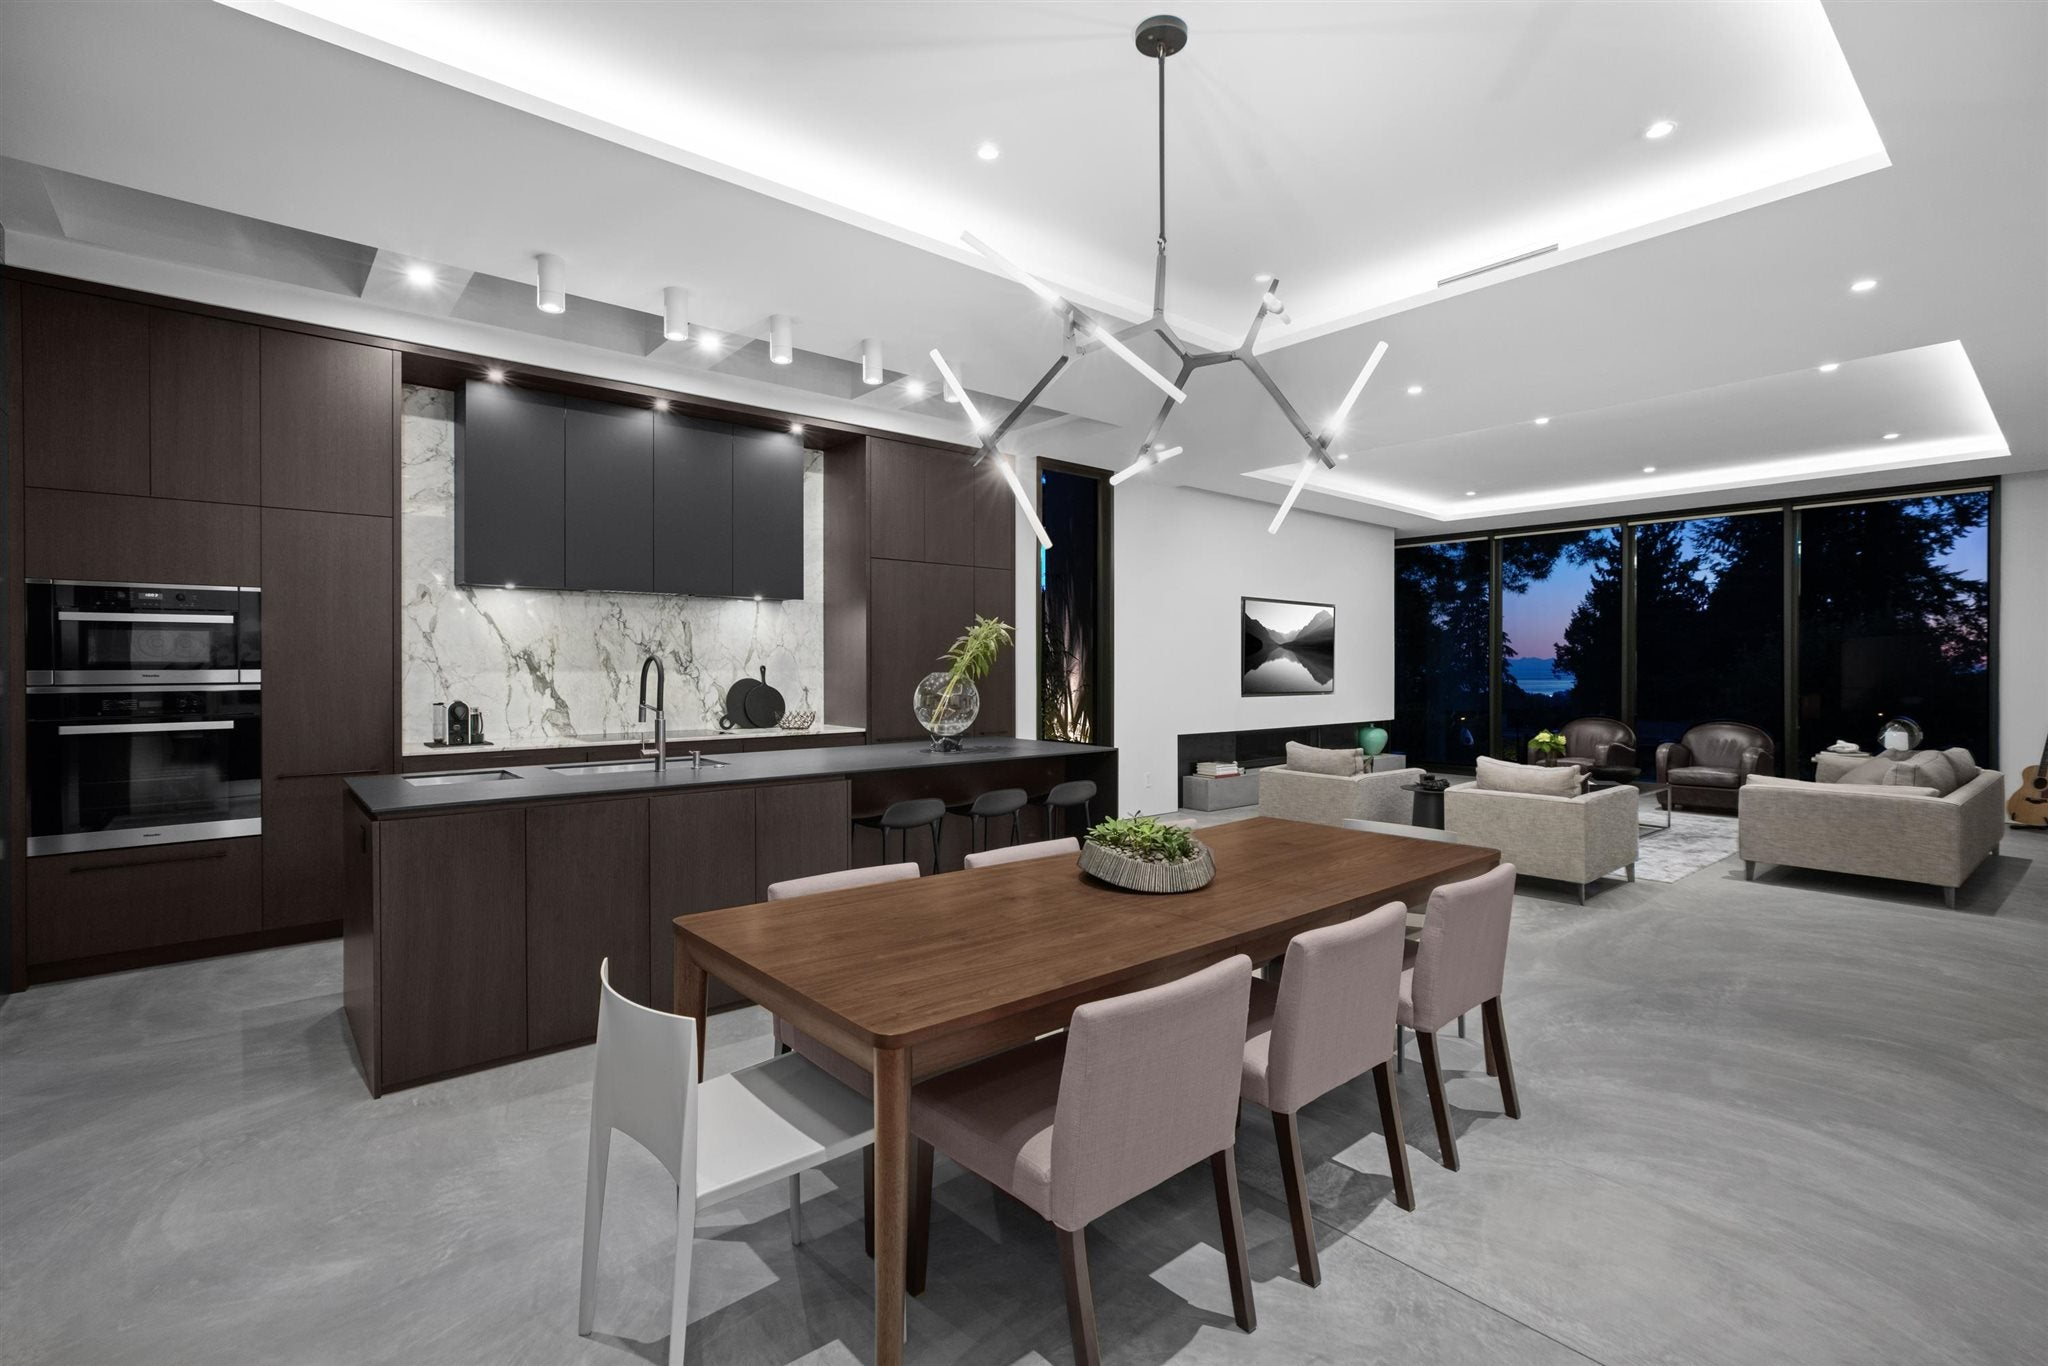 276 SANDRINGHAM CRESCENT - Upper Lonsdale House/Single Family for sale, 7 Bedrooms (R2617703) - #5